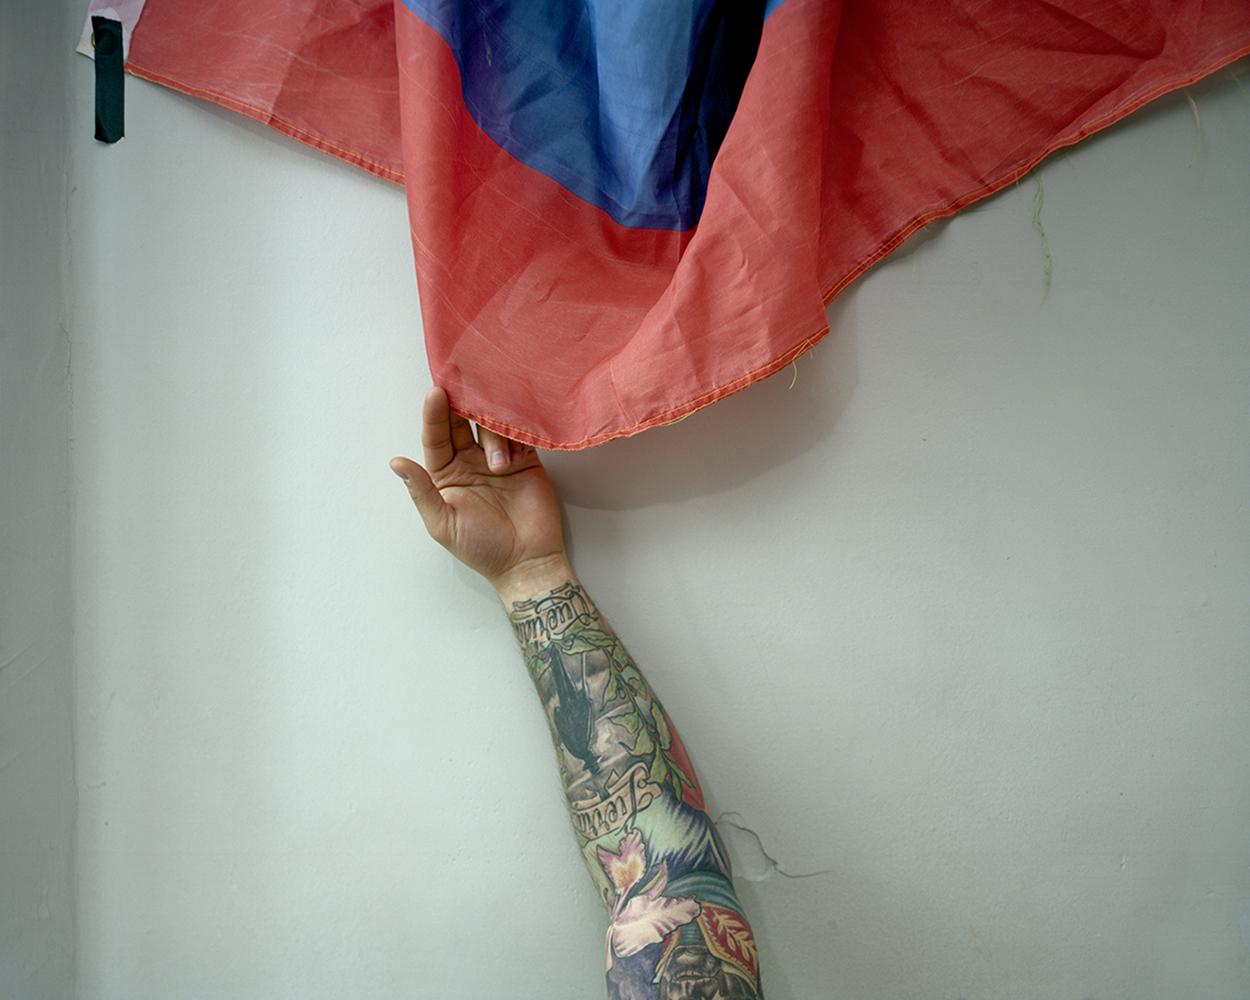 Luis' Arm/Puro Colombia  , Juan Giraldo    Nonfiction: 3rd Place Contest Winner,  Rice Grain Girl,  Alysia Sachwyn